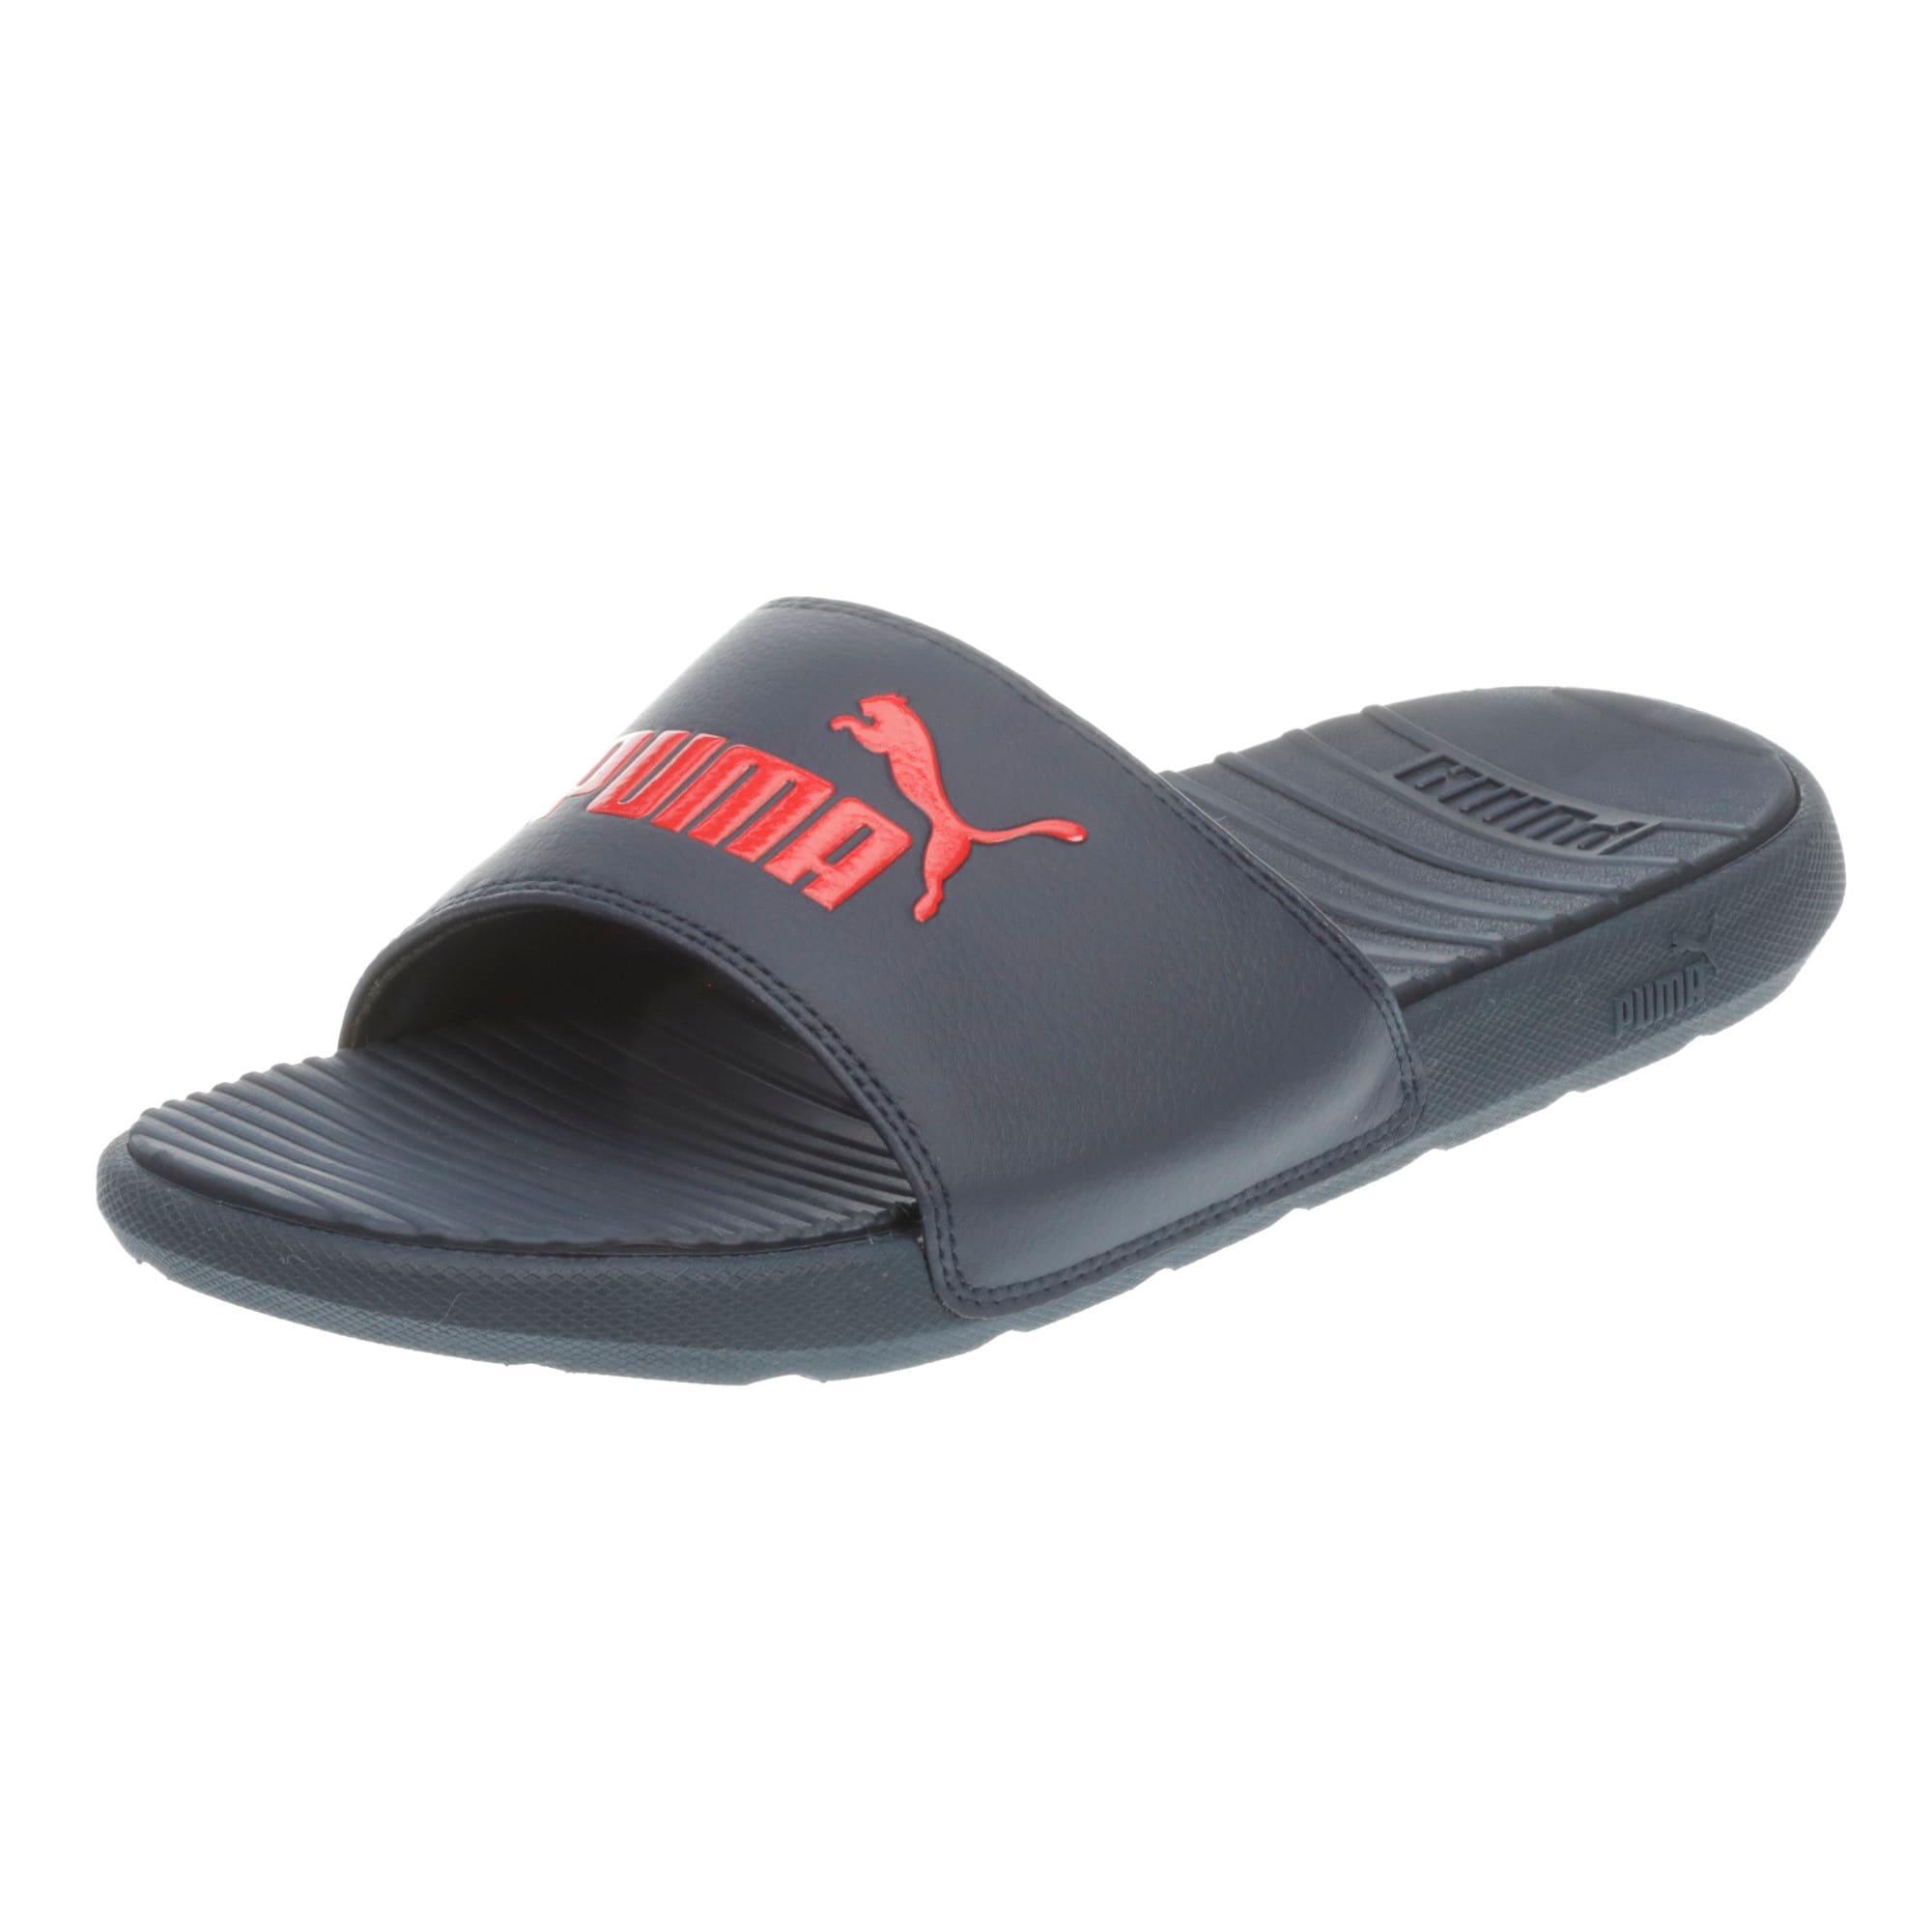 puma red eva flip flops